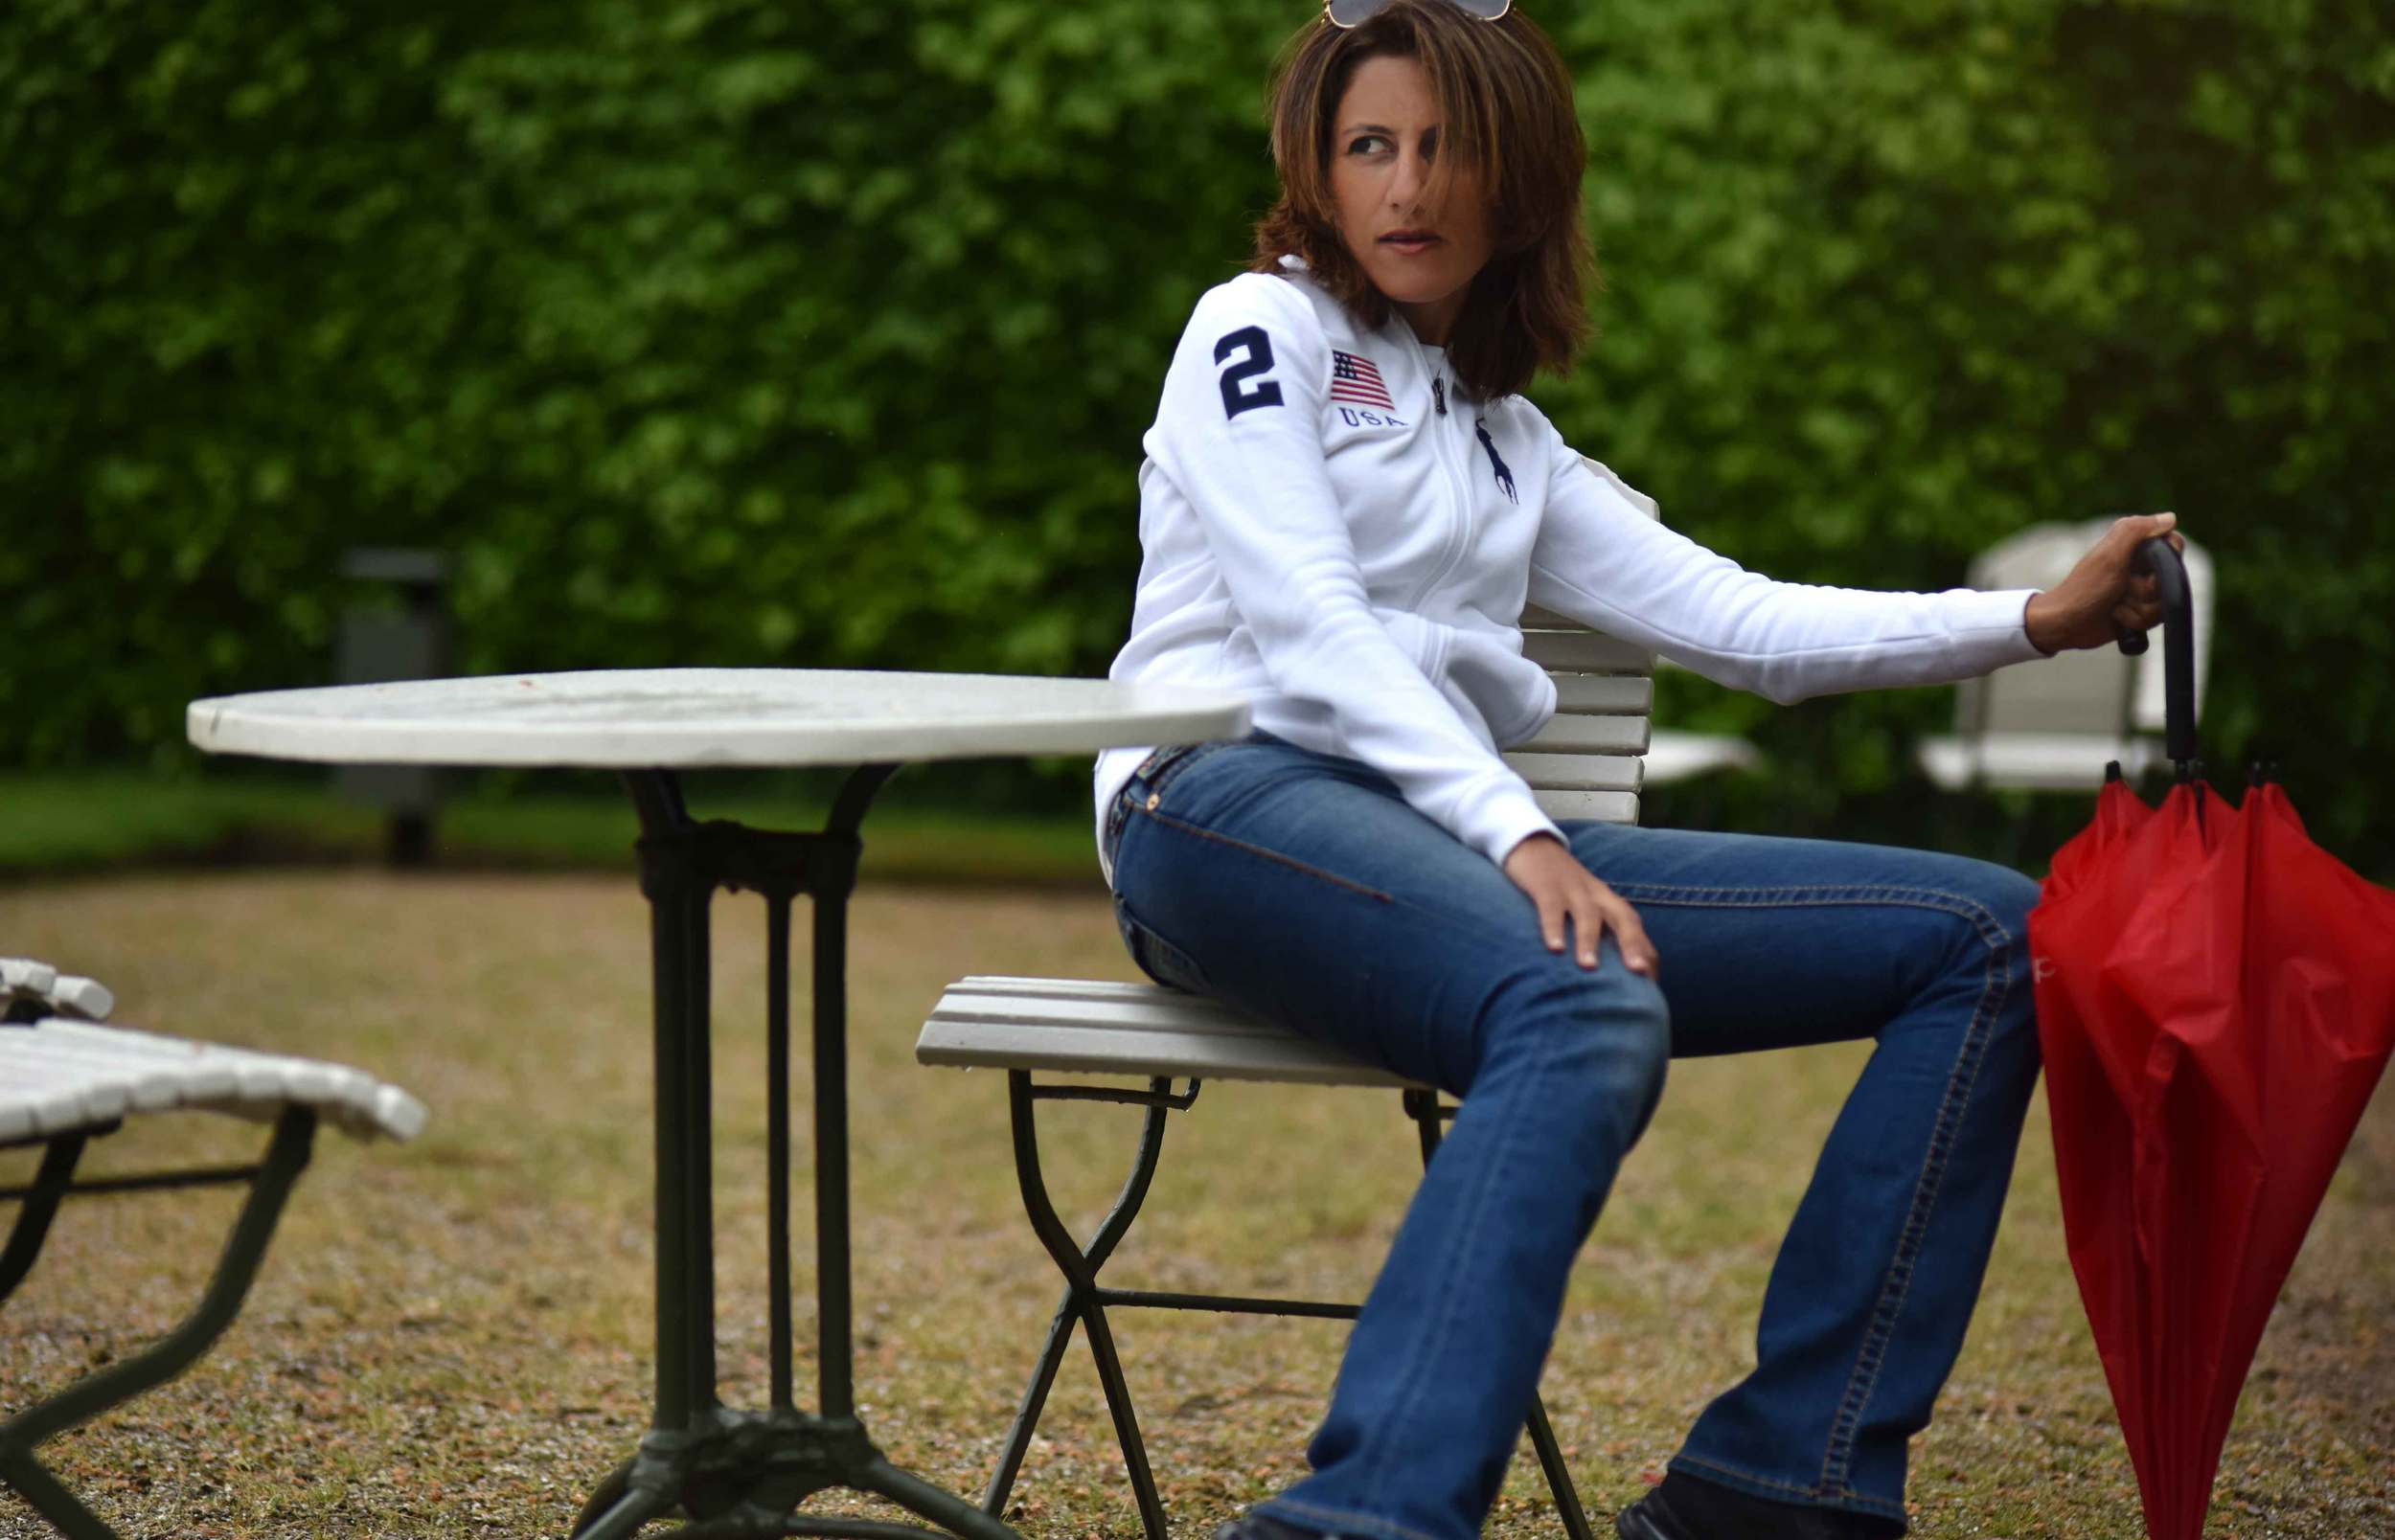 White Ralph Lauren Polo jacket, True Religion jeans, Gönneranlage, historic park, Baden Baden, Germany. Image©sourcingstyle.com